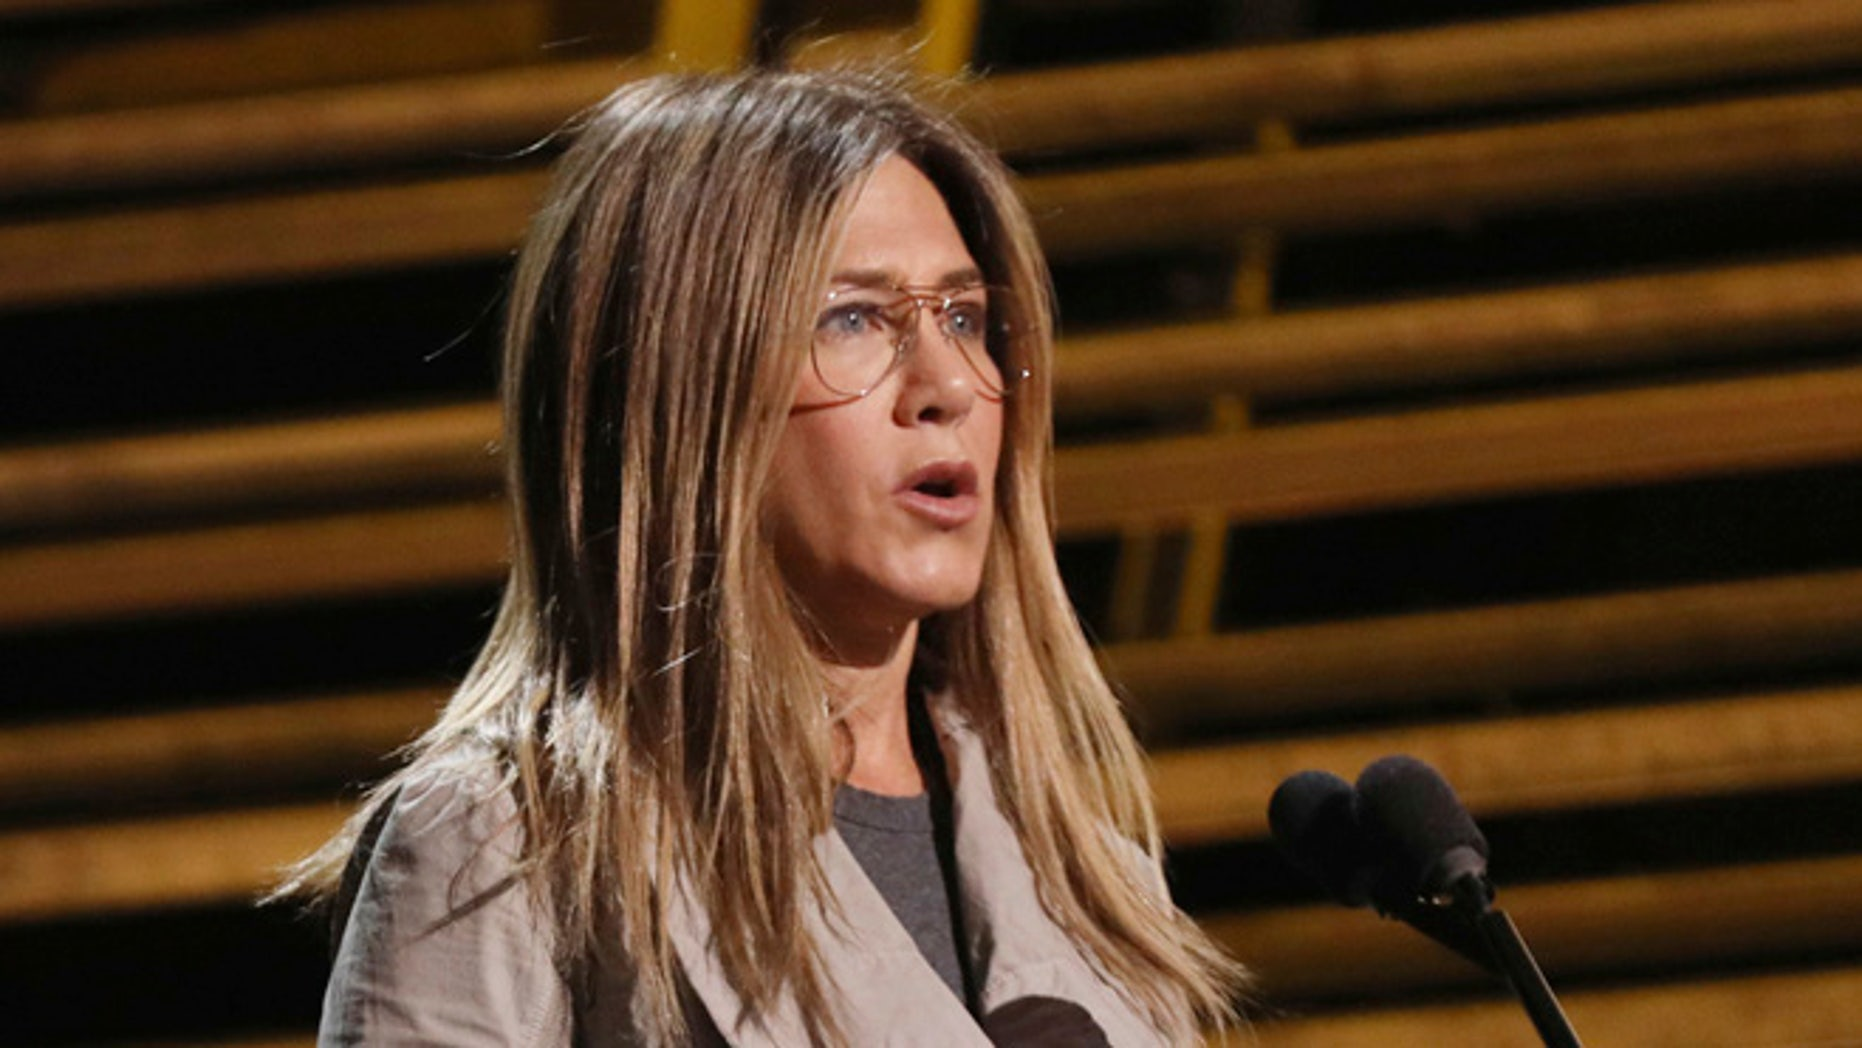 Jennifer Aniston at the Oscar rehearsals.